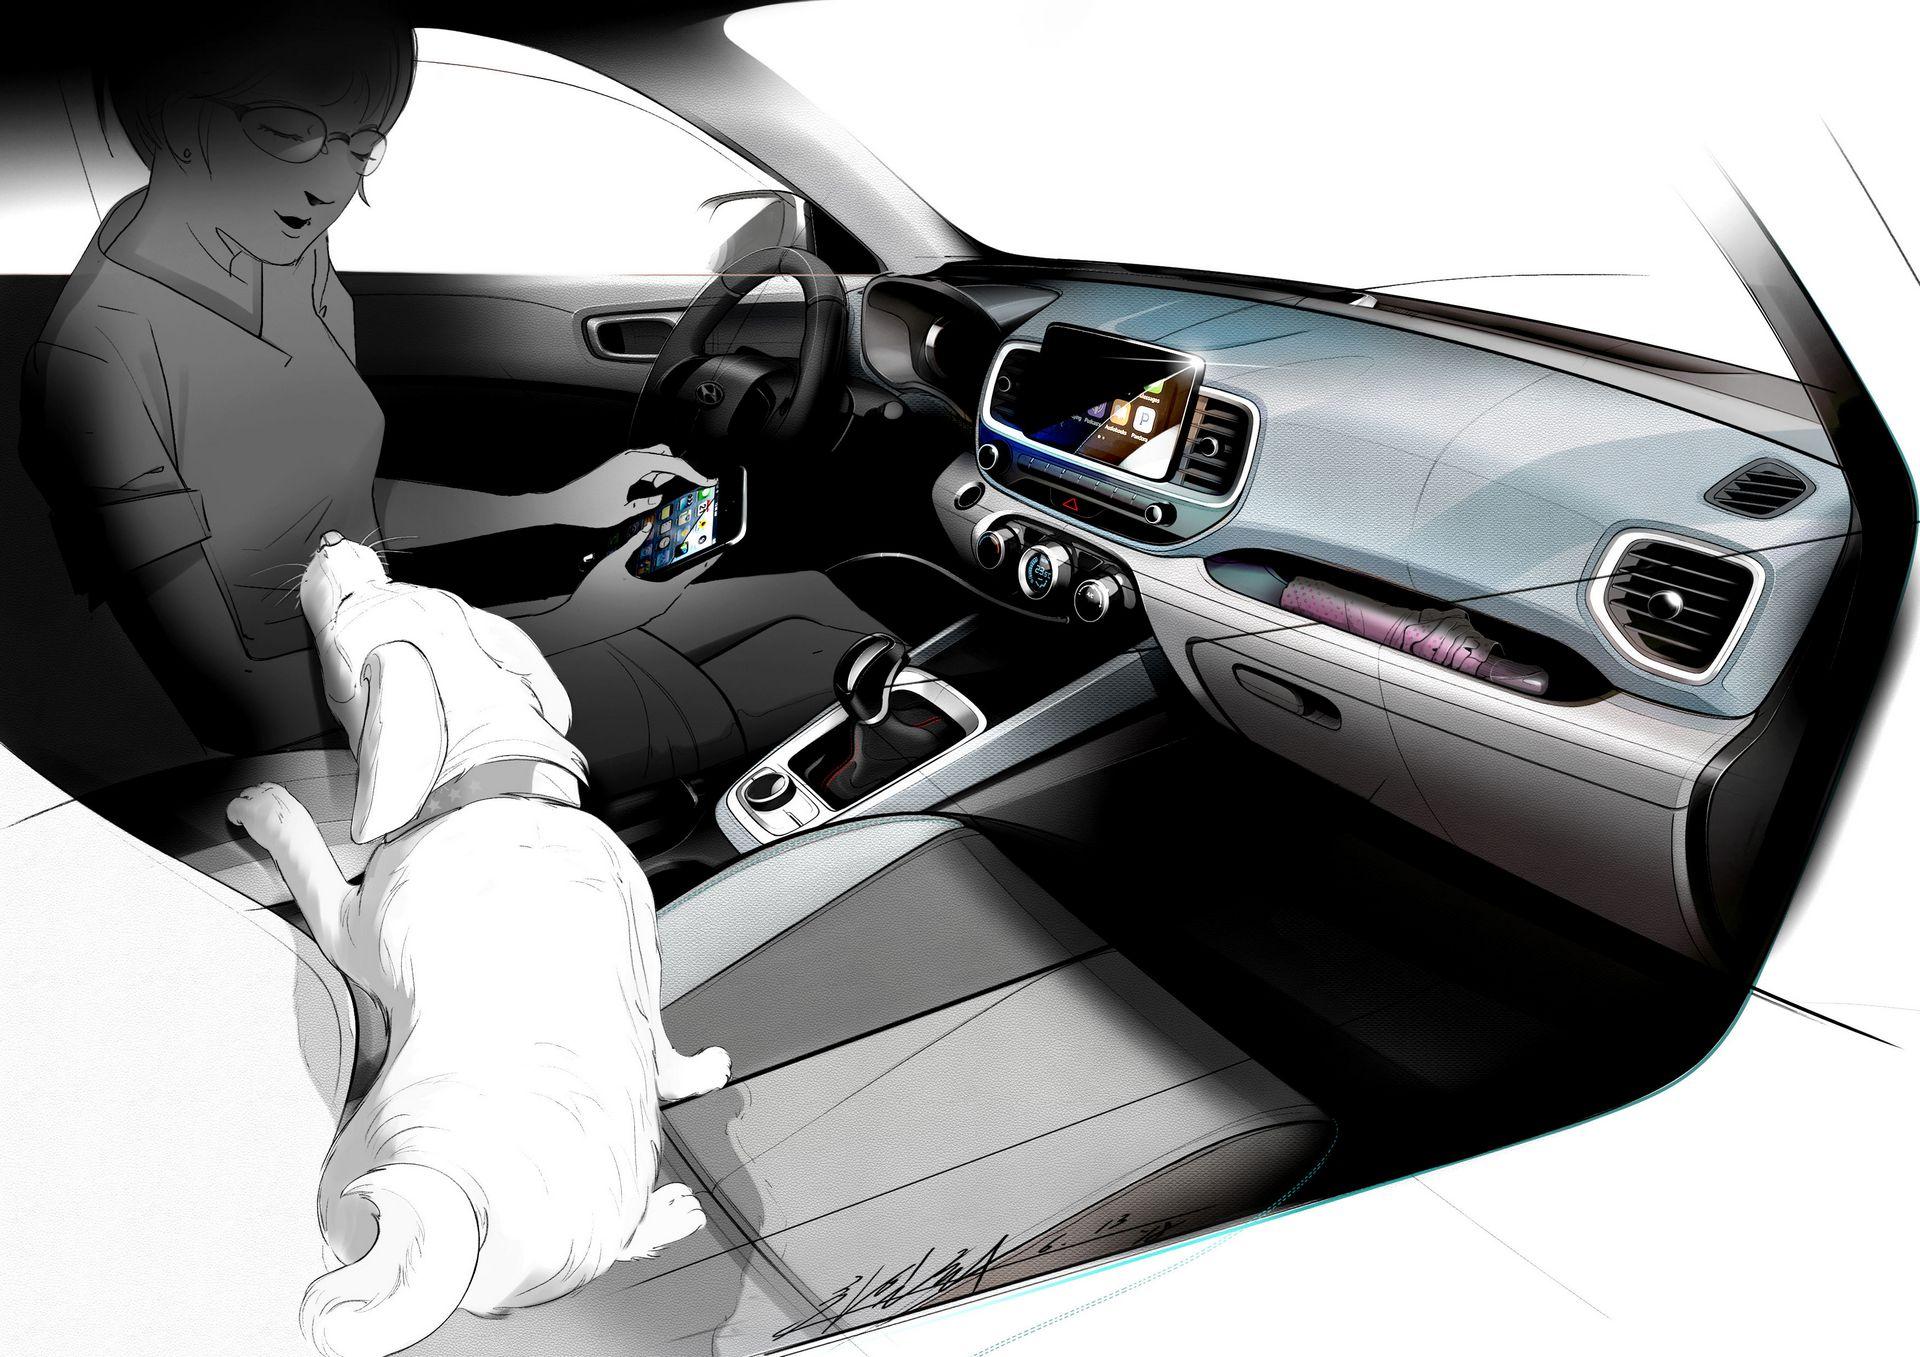 2020 Hyundai Venue Looks Predictable In Official Design